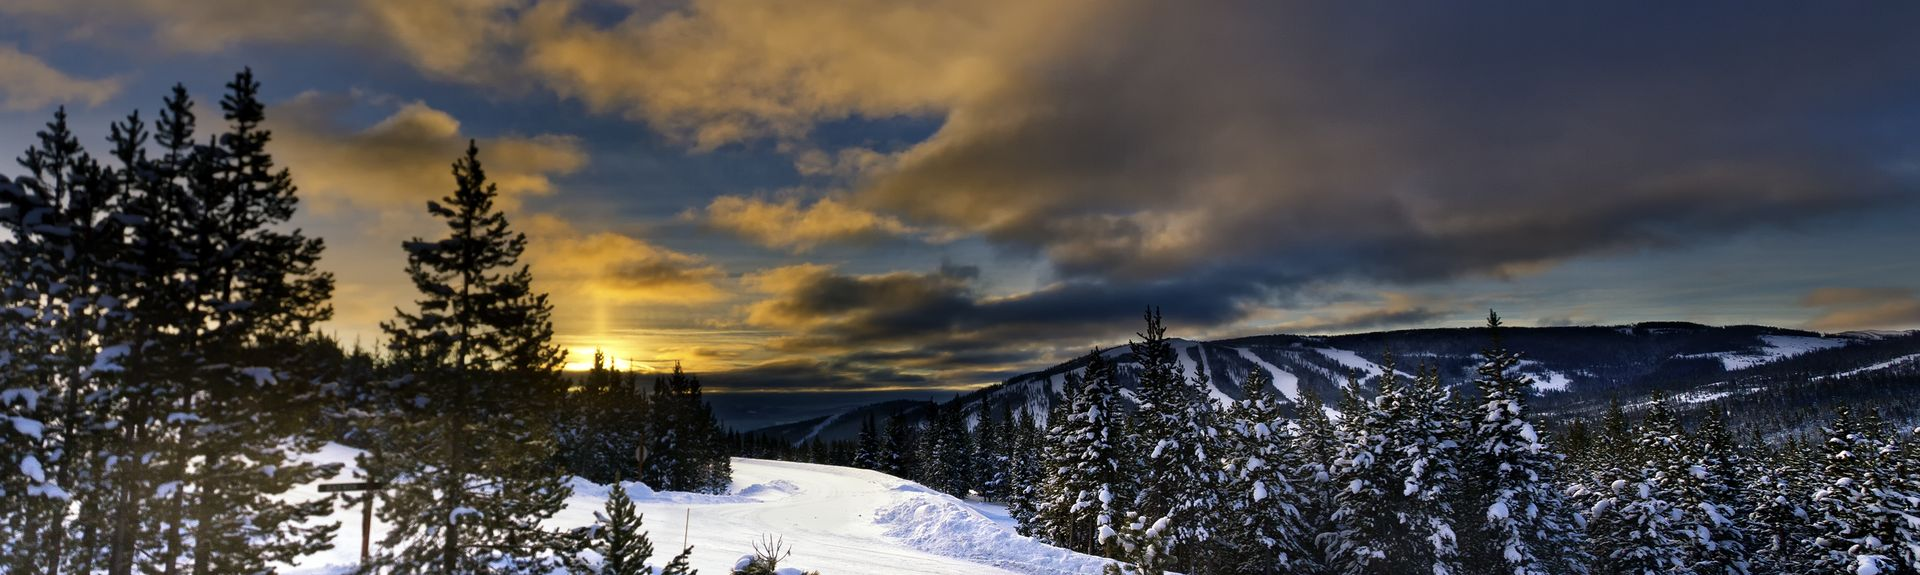 Big Sky Mountain Village, Big Sky, MT, USA